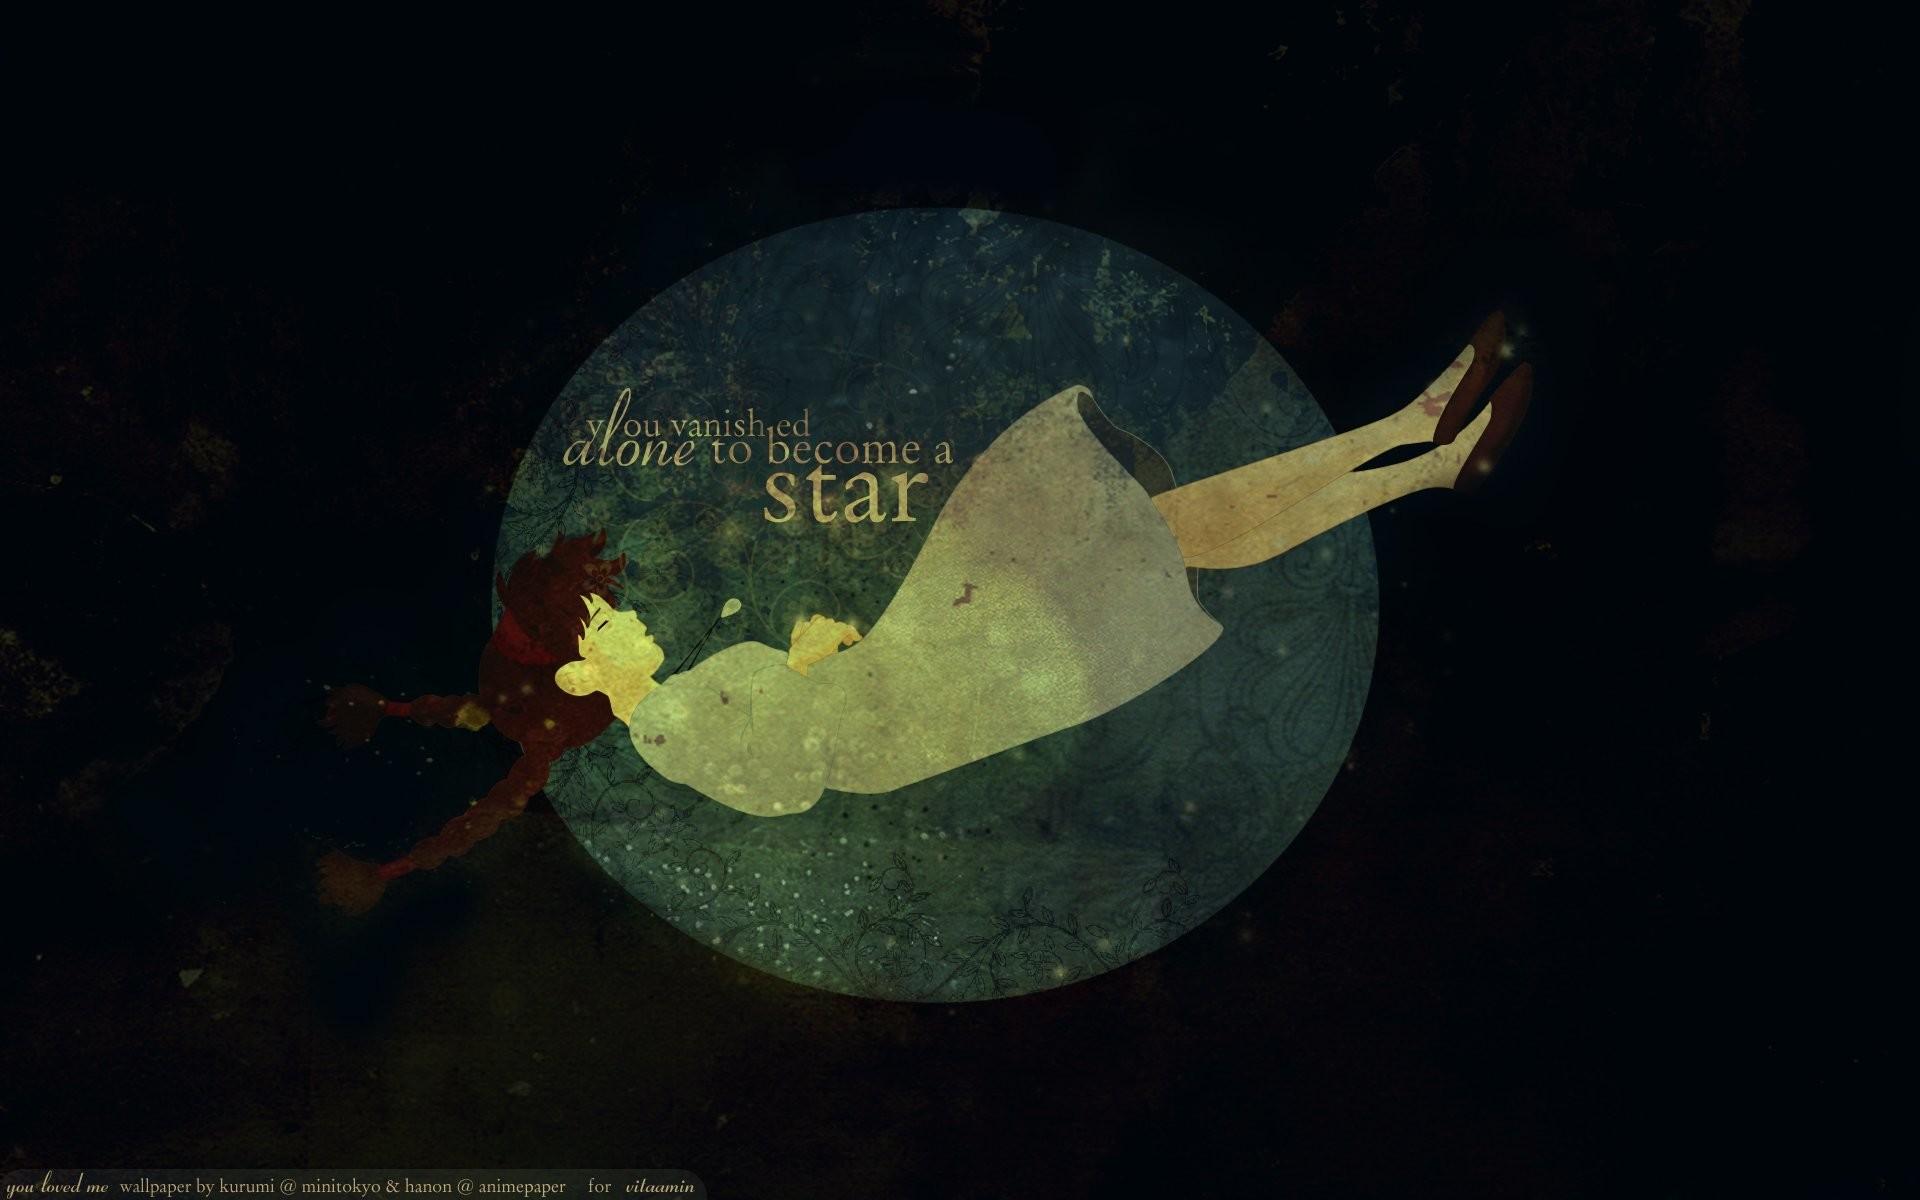 Studio Ghibli 406078. SHARE. TAGS: Minitokyo Sky Castle